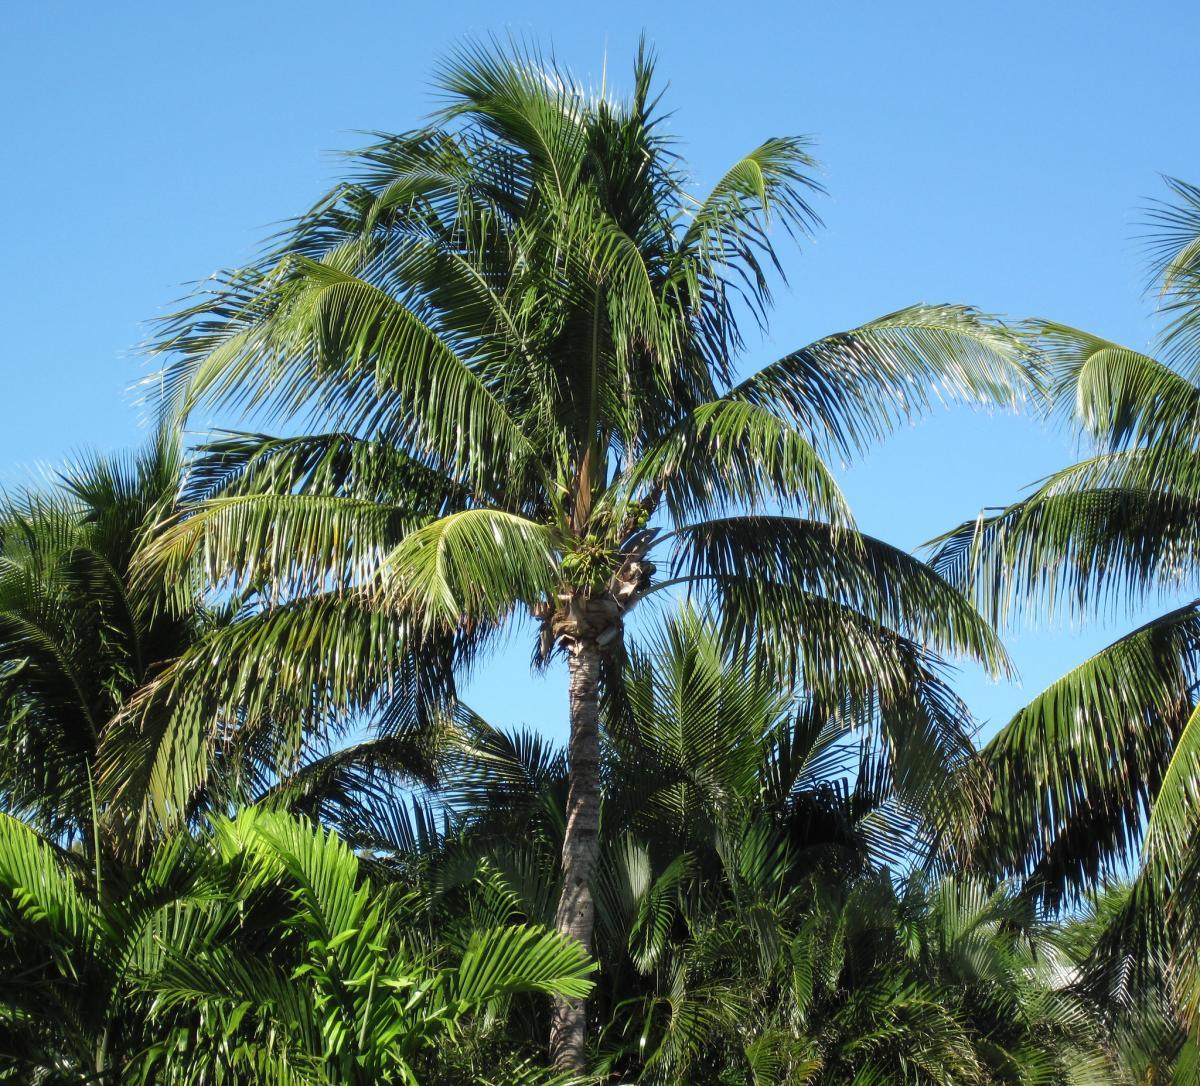 El cocotero vive en la selva tropical